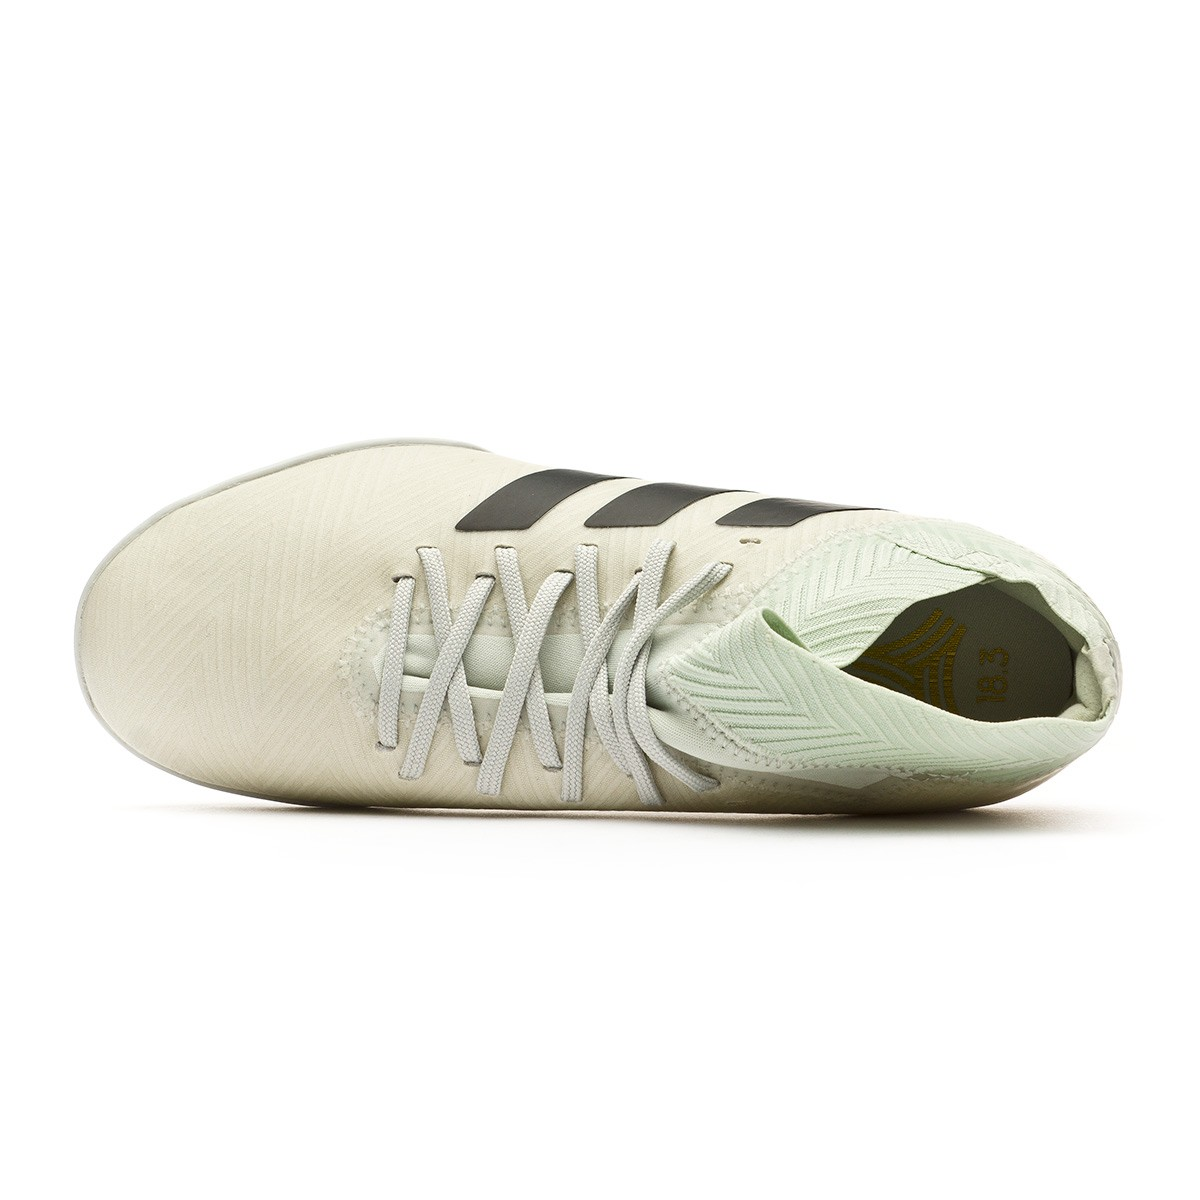 72755f3540608 Tenis adidas Nemeziz Tango 18.3 Turf Niño Ash silver-White tint - Tienda de  fútbol Fútbol Emotion